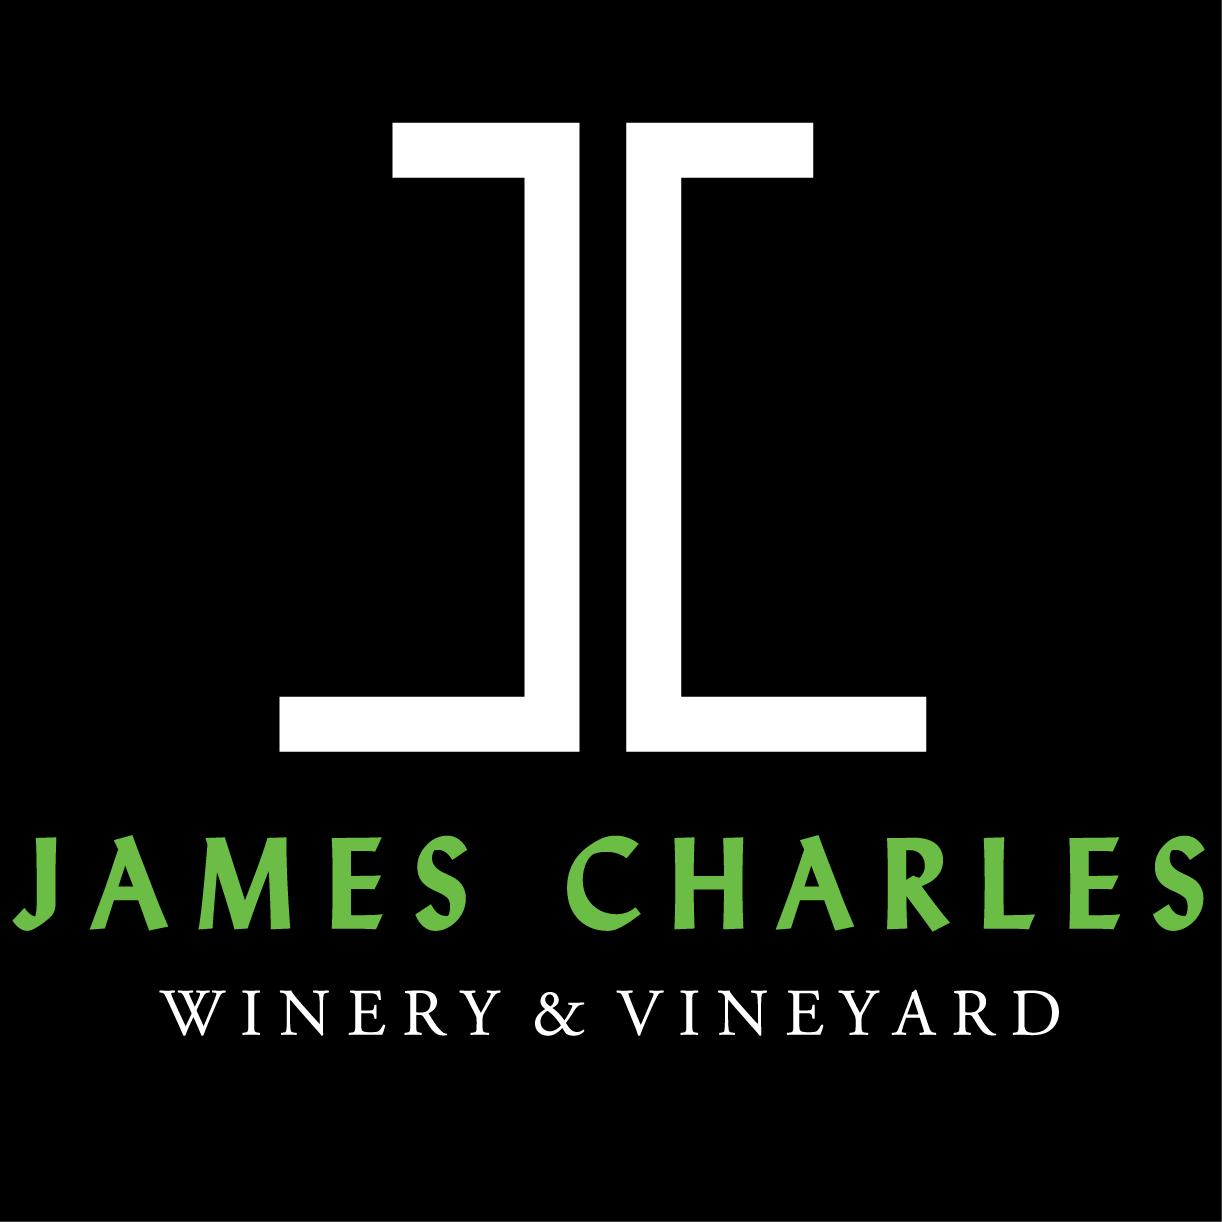 James Charles Winery